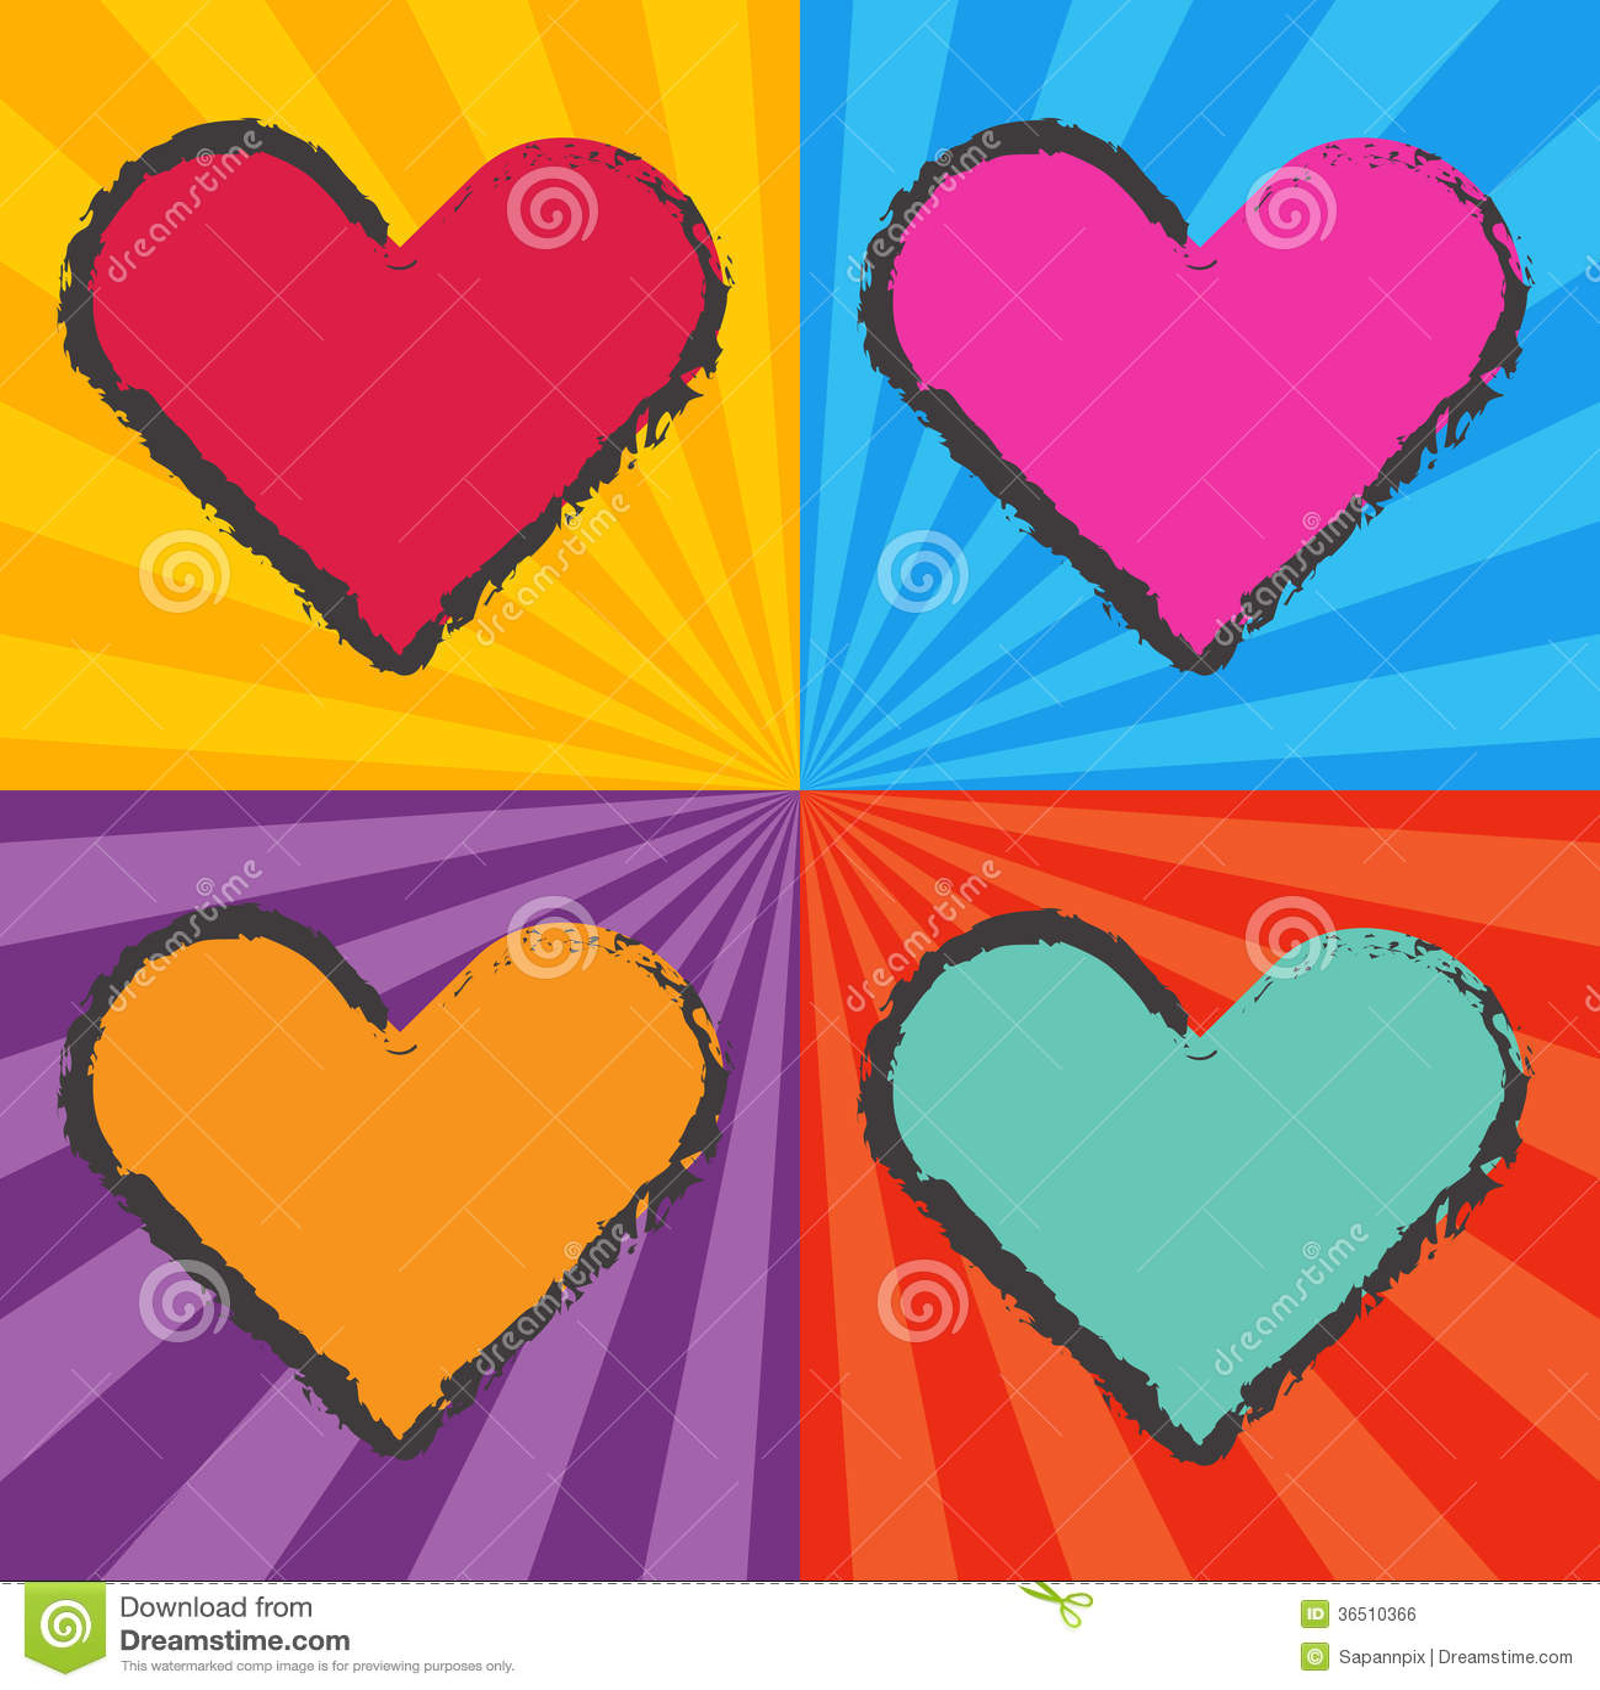 Pop Art Heart Royalty Free Stock Image - Image: 36510366